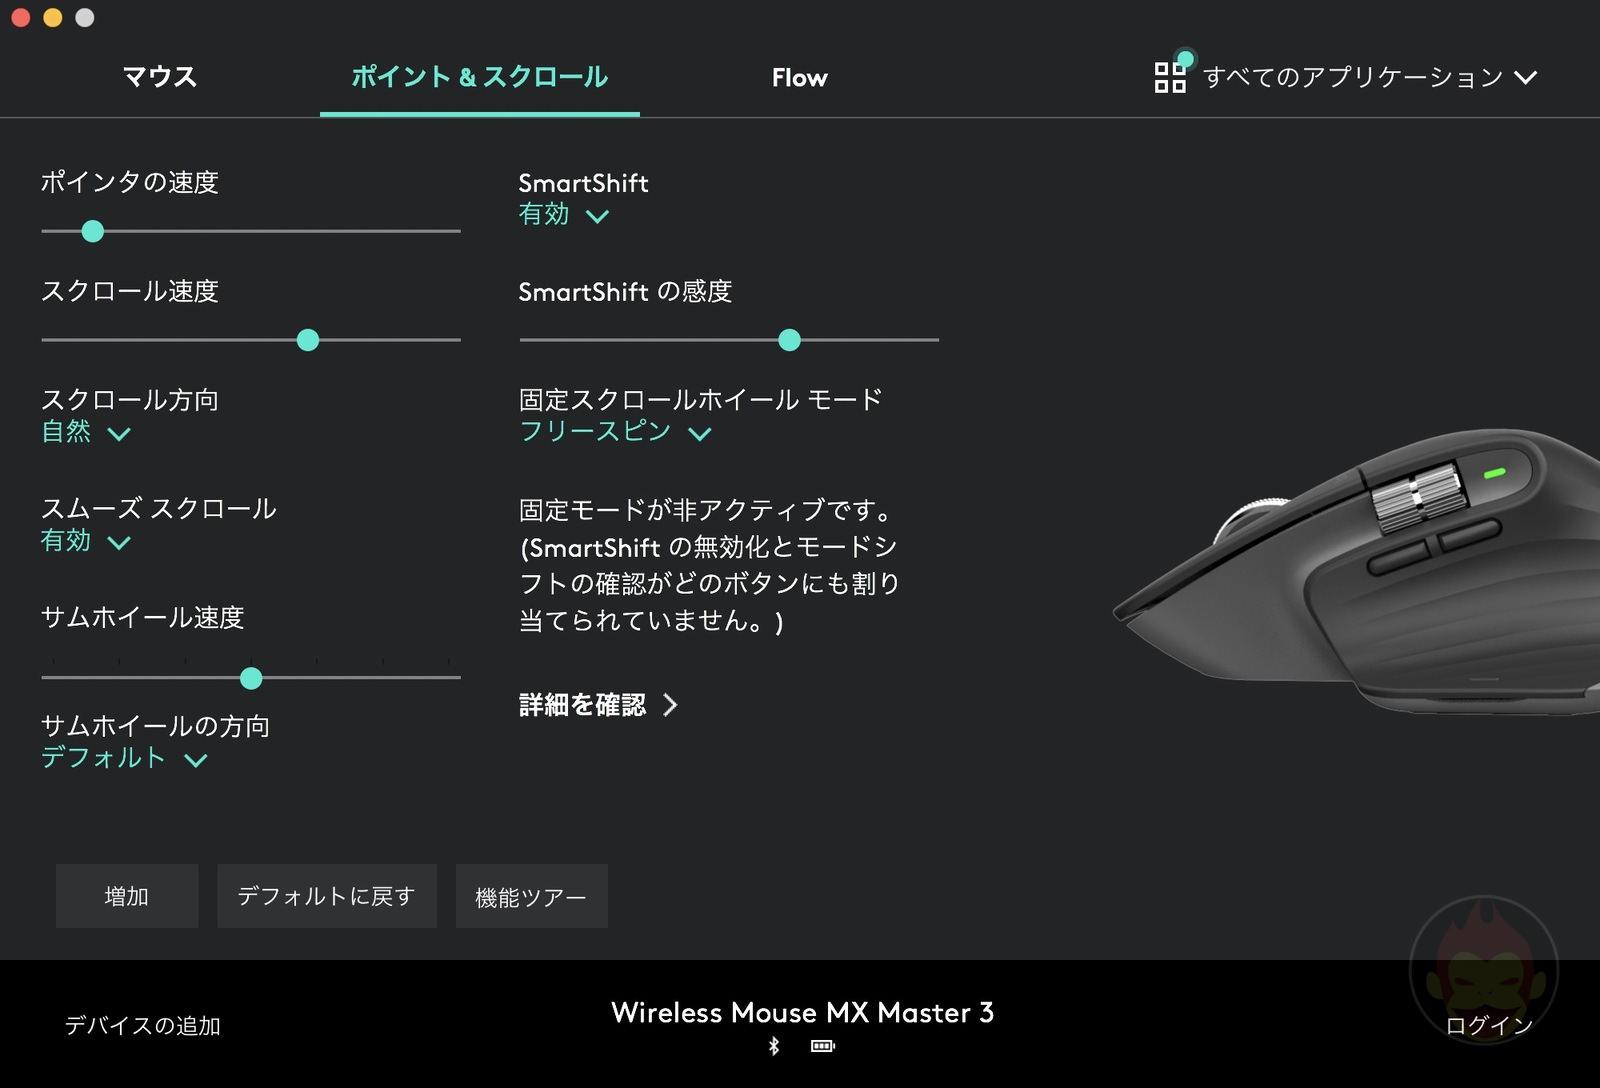 Logi-Options-MX-Master-3-01.jpg